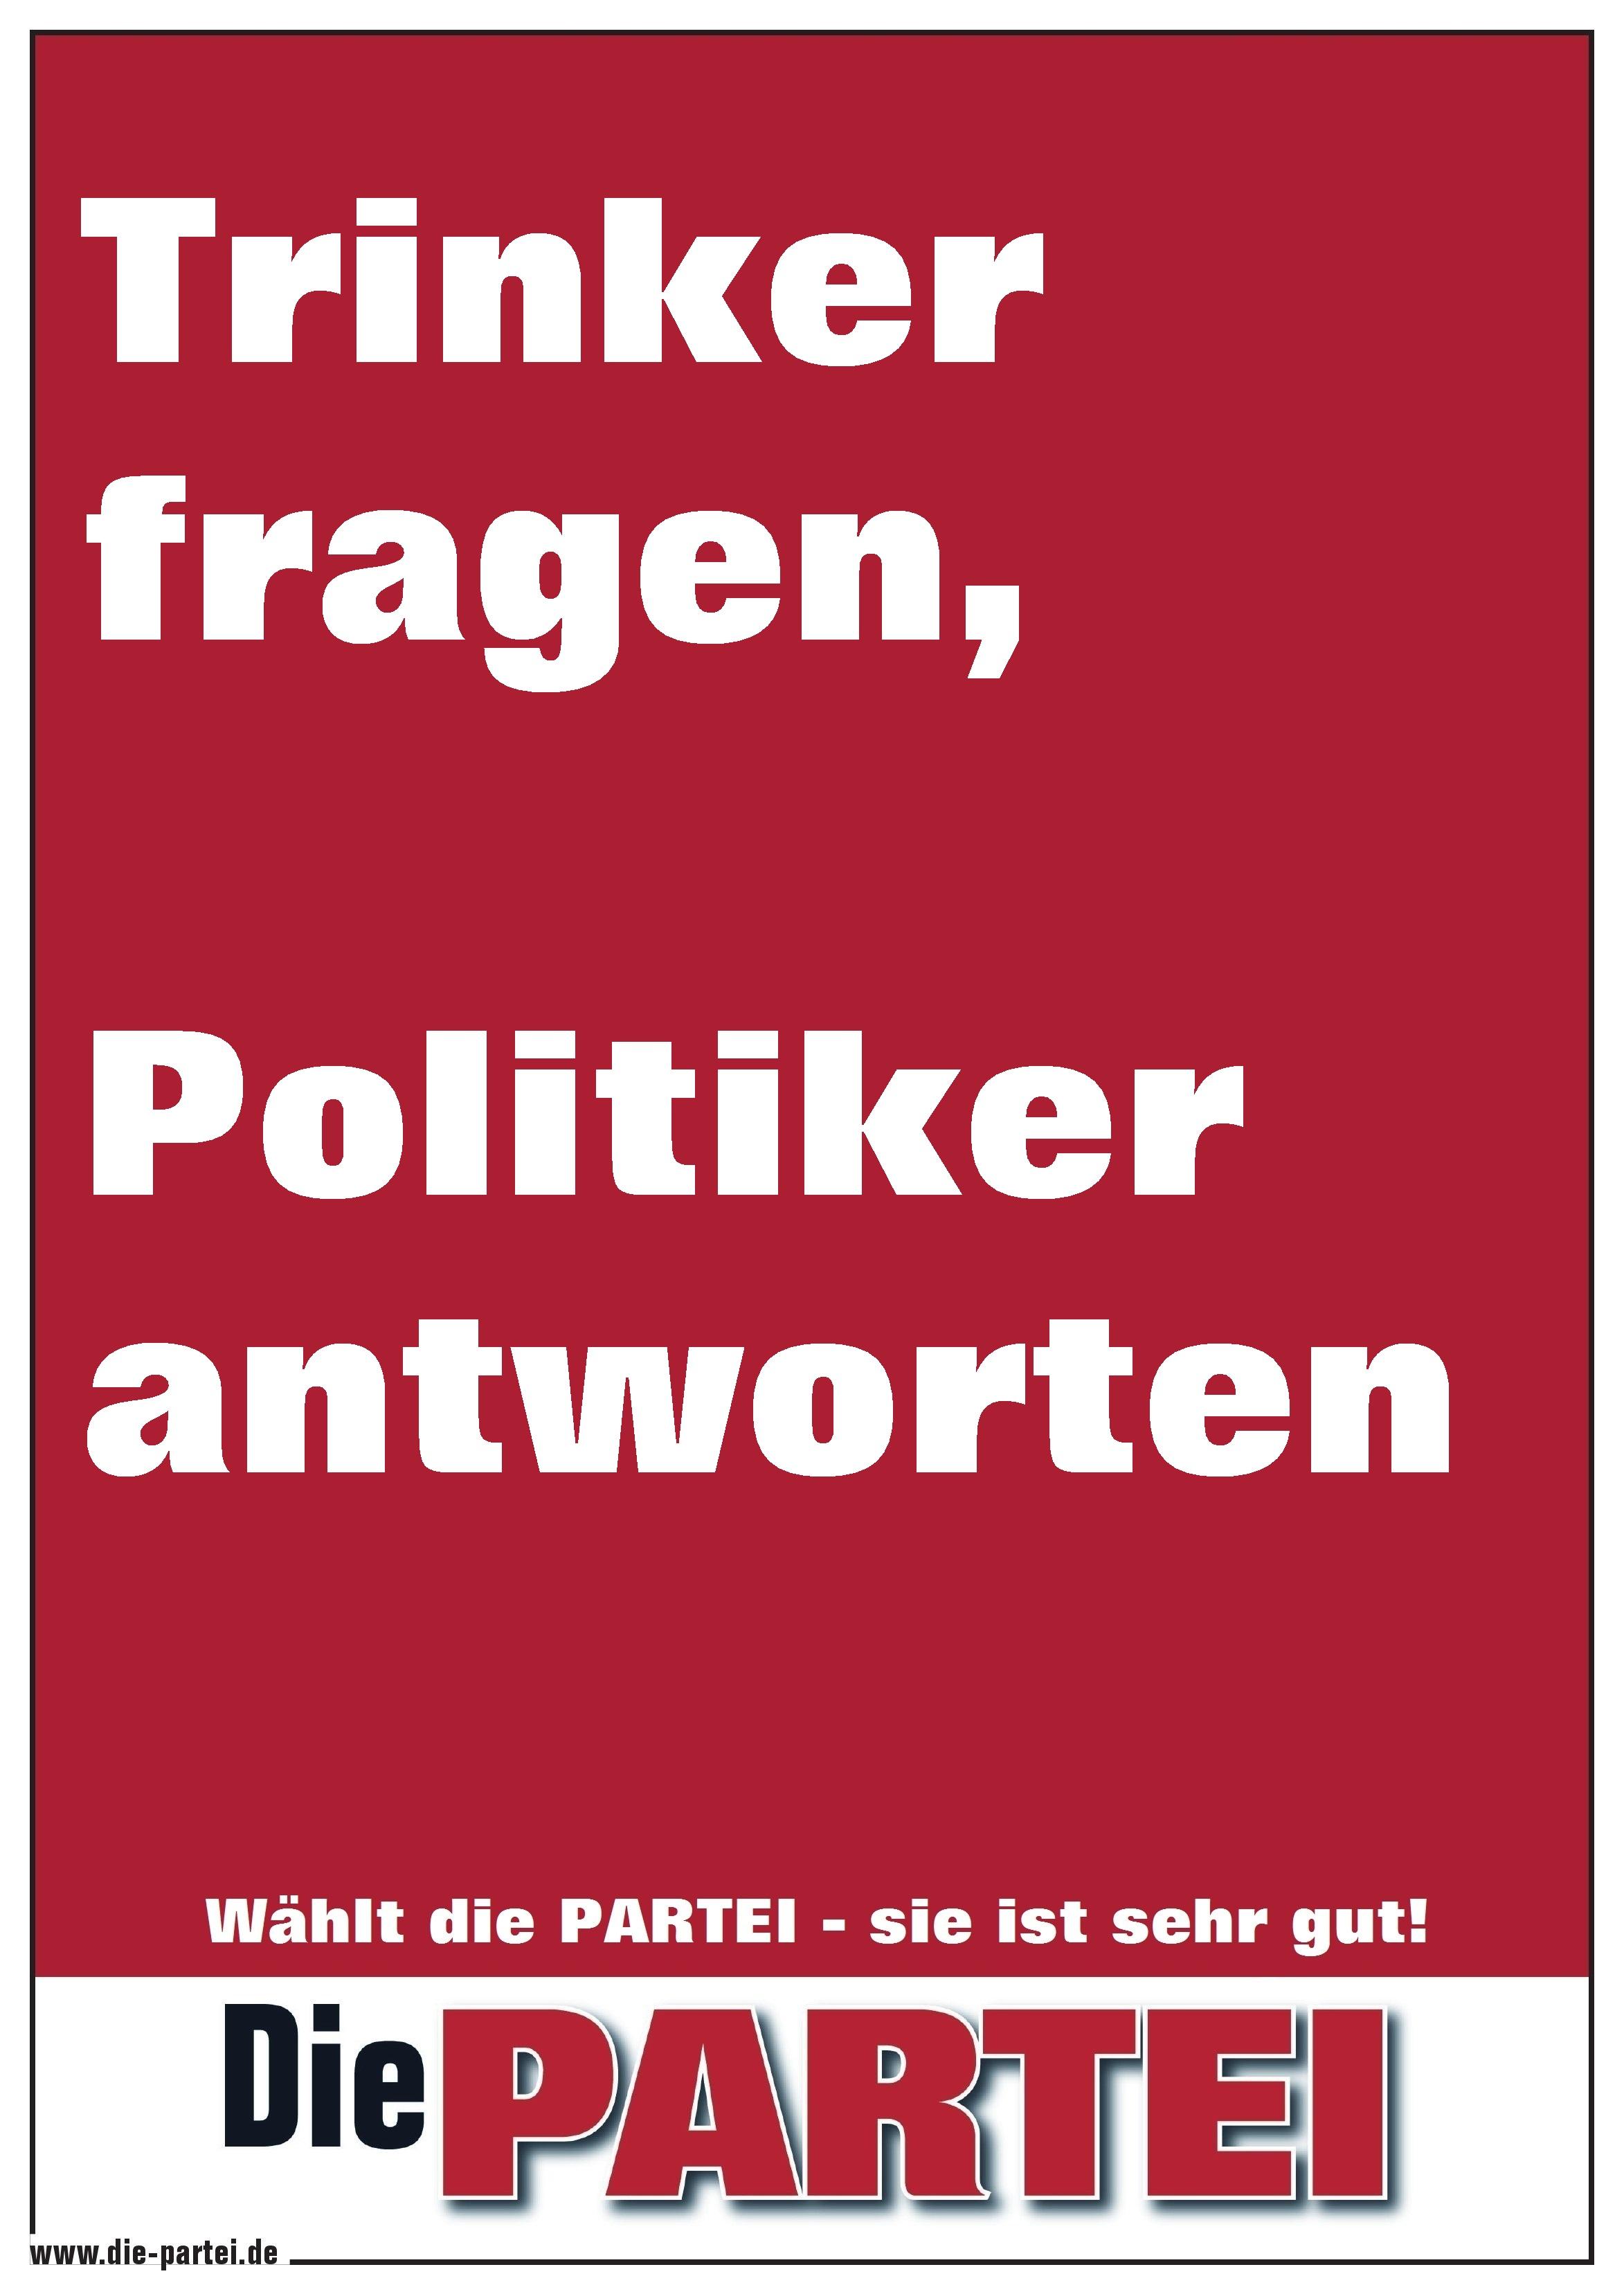 OB-Wahl 2015 in Hanau –  Wahlkampf(Kneipen)tour